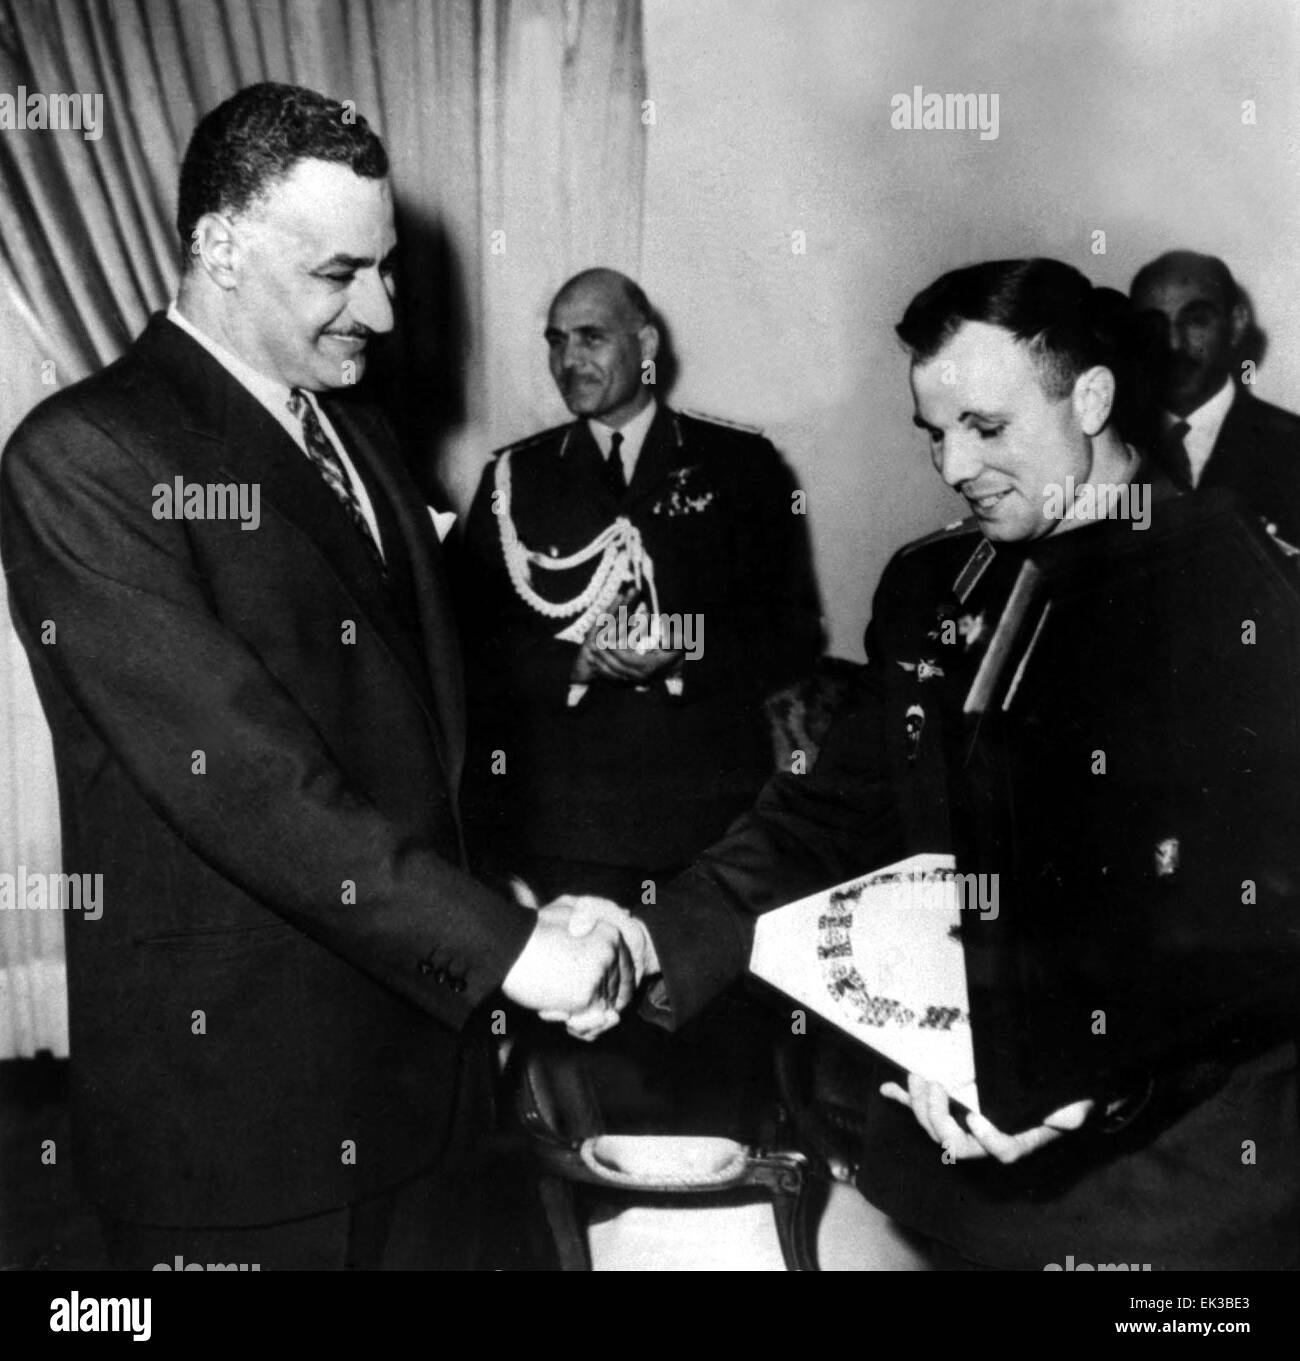 Soviet cosmonaut Yuri Gagarin visiting Egypt. Egyptian President Gamal Abdel Nasser presenting Yuri Gagarin with - Stock Image